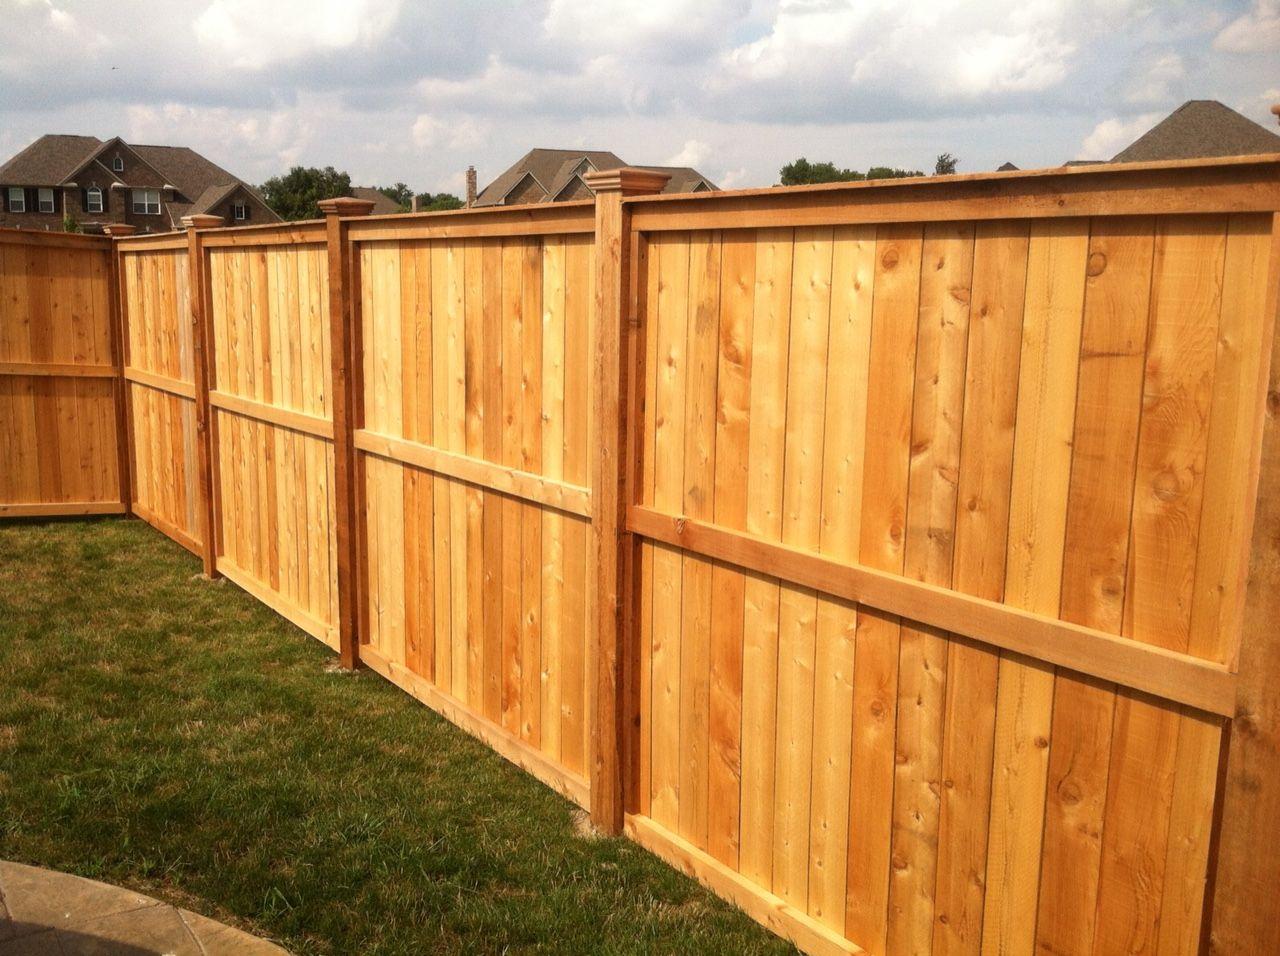 Fences We Build Iron Vinyl Wooden Chain Link Repairs Gates